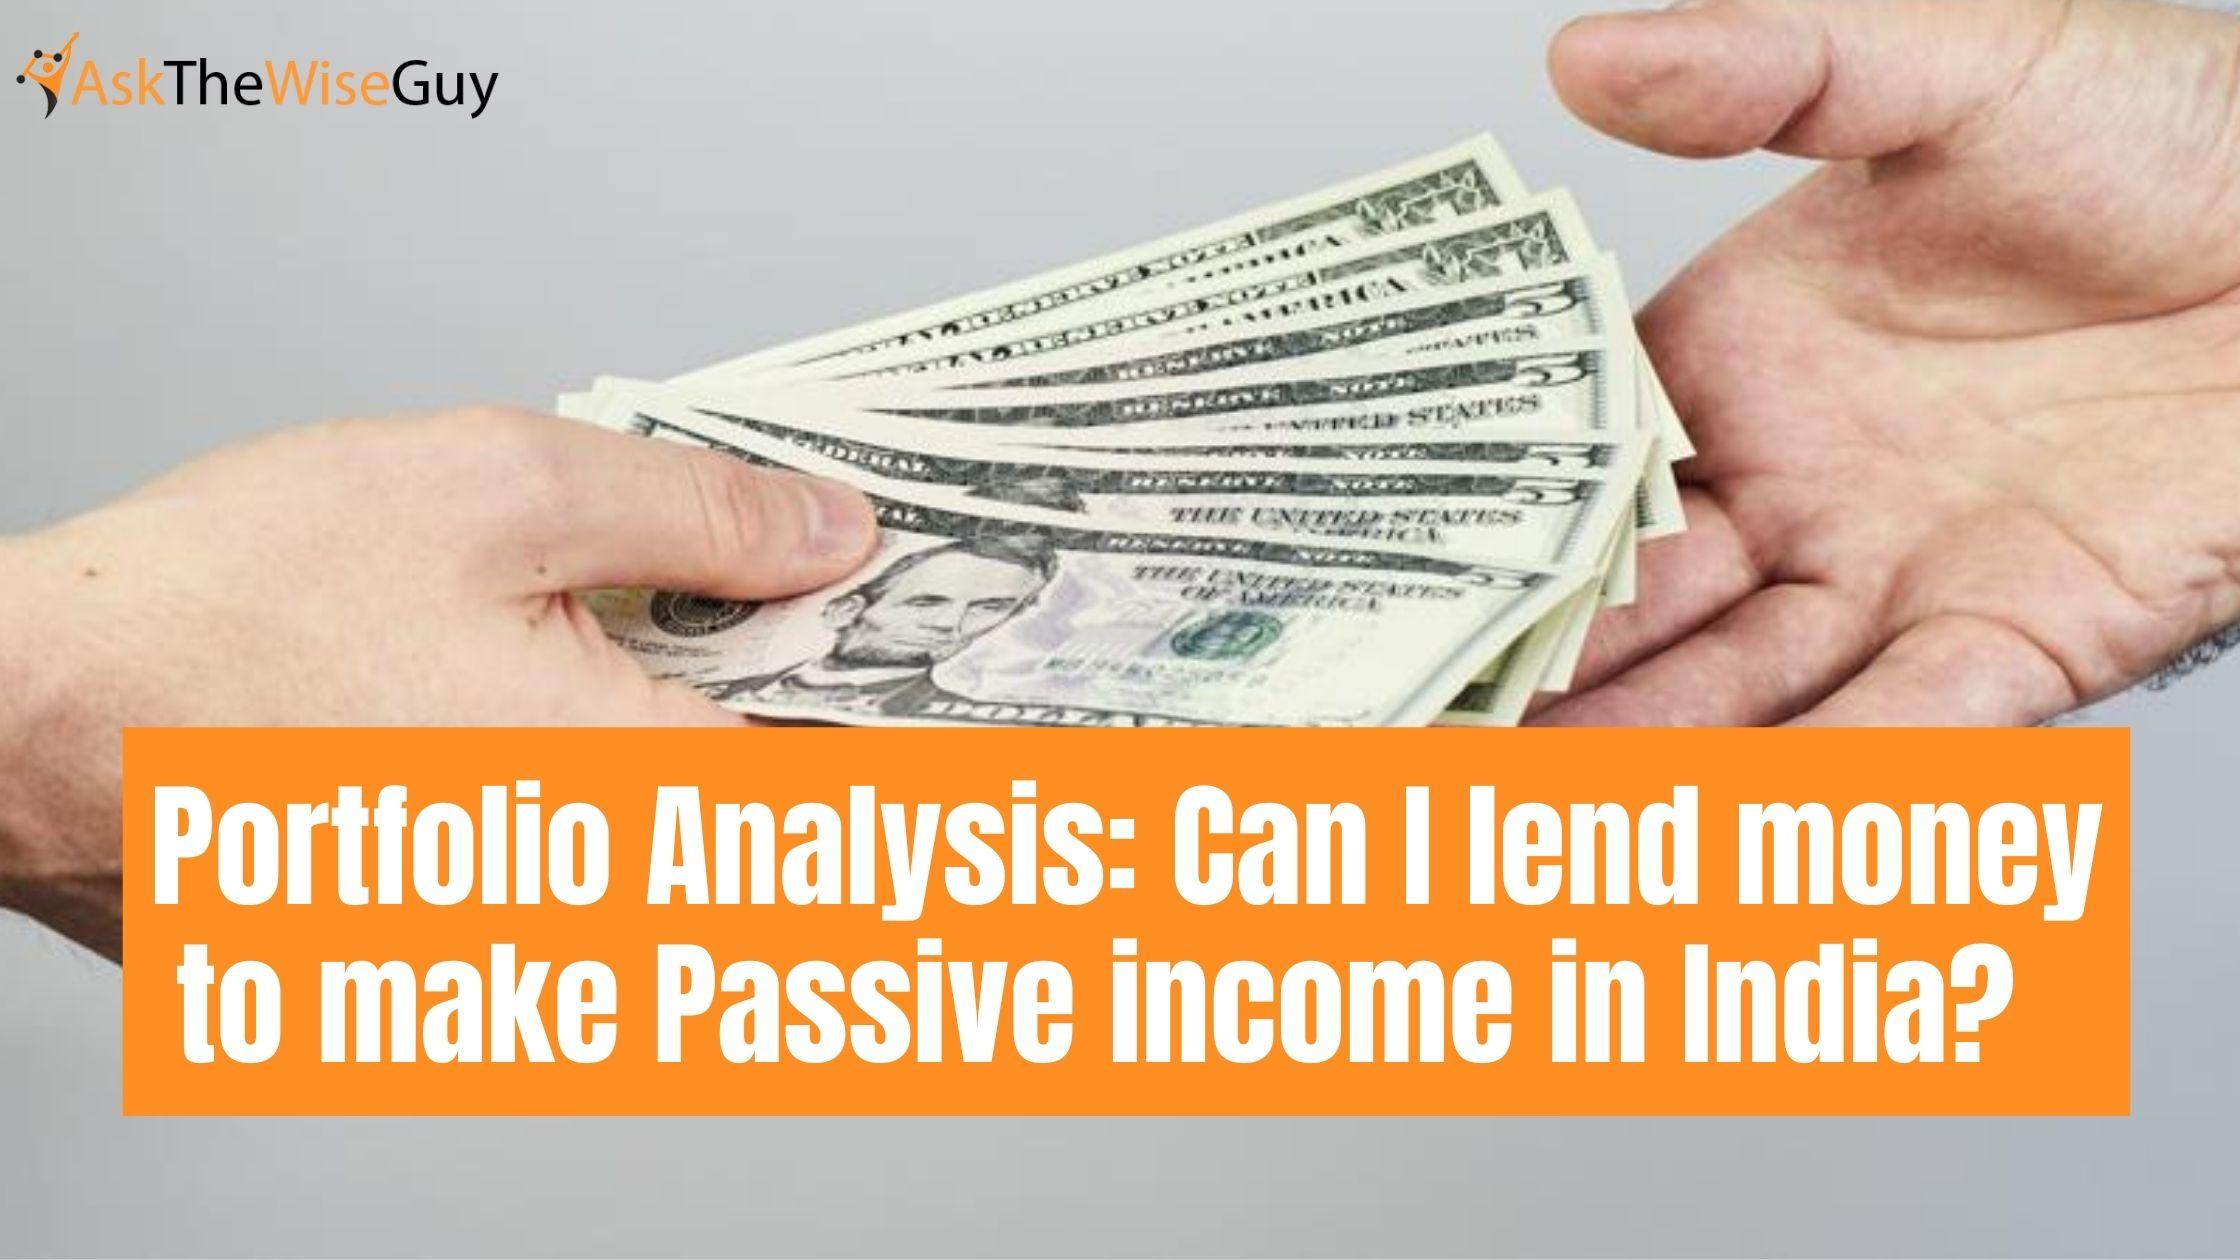 Portfolio Analysis: Can I lend money to make Passive income in India?